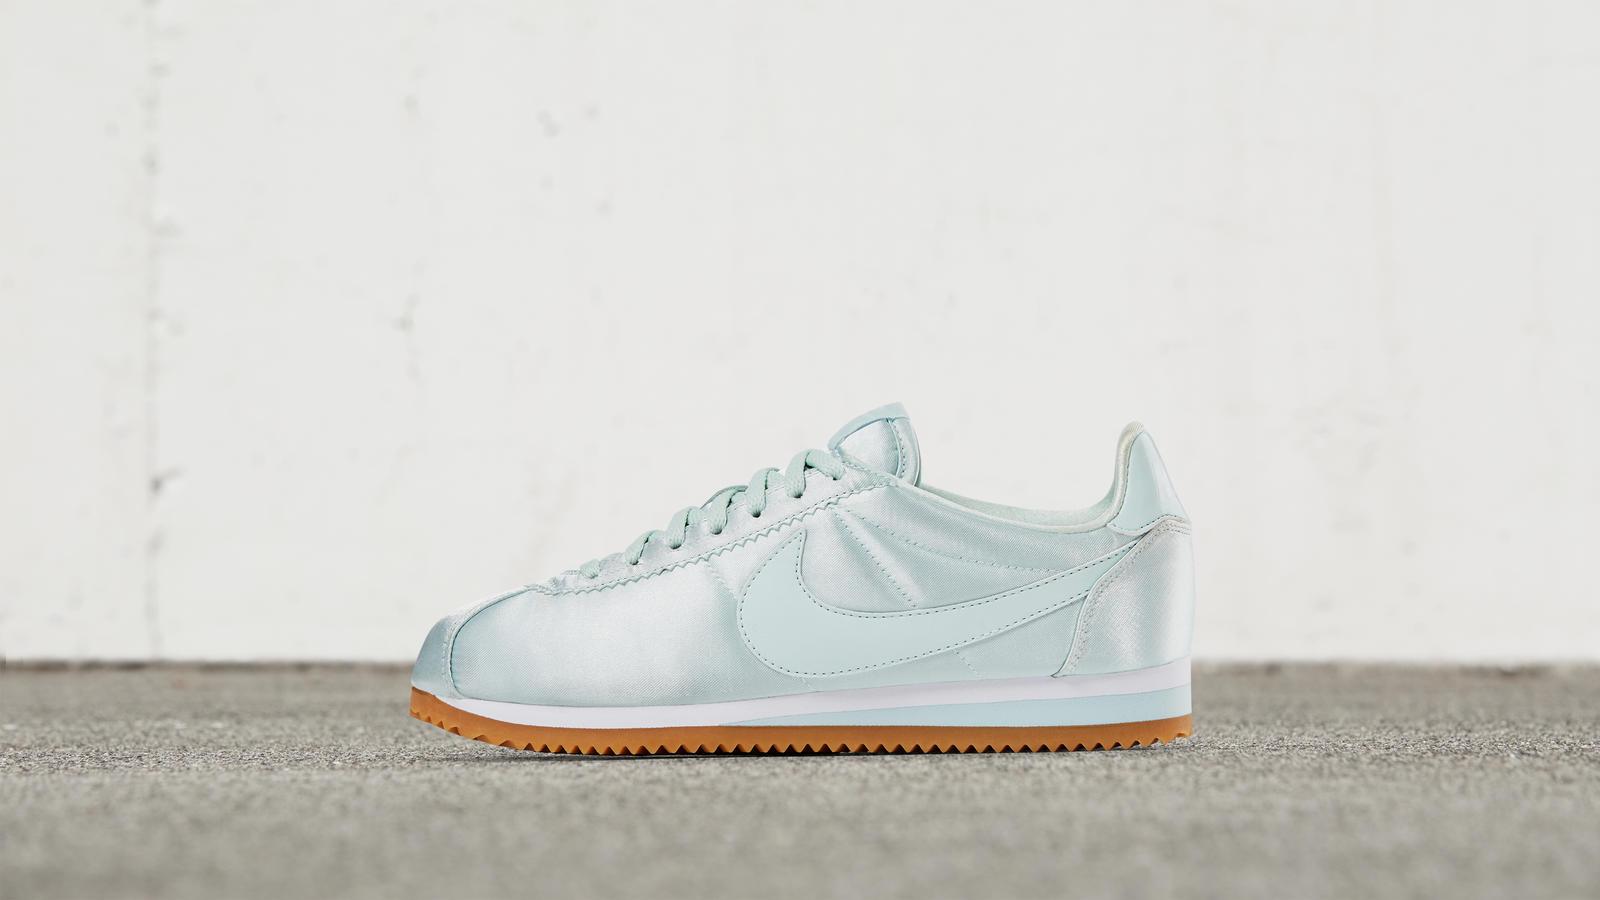 Nike Classic Cortez Satin - Nike News